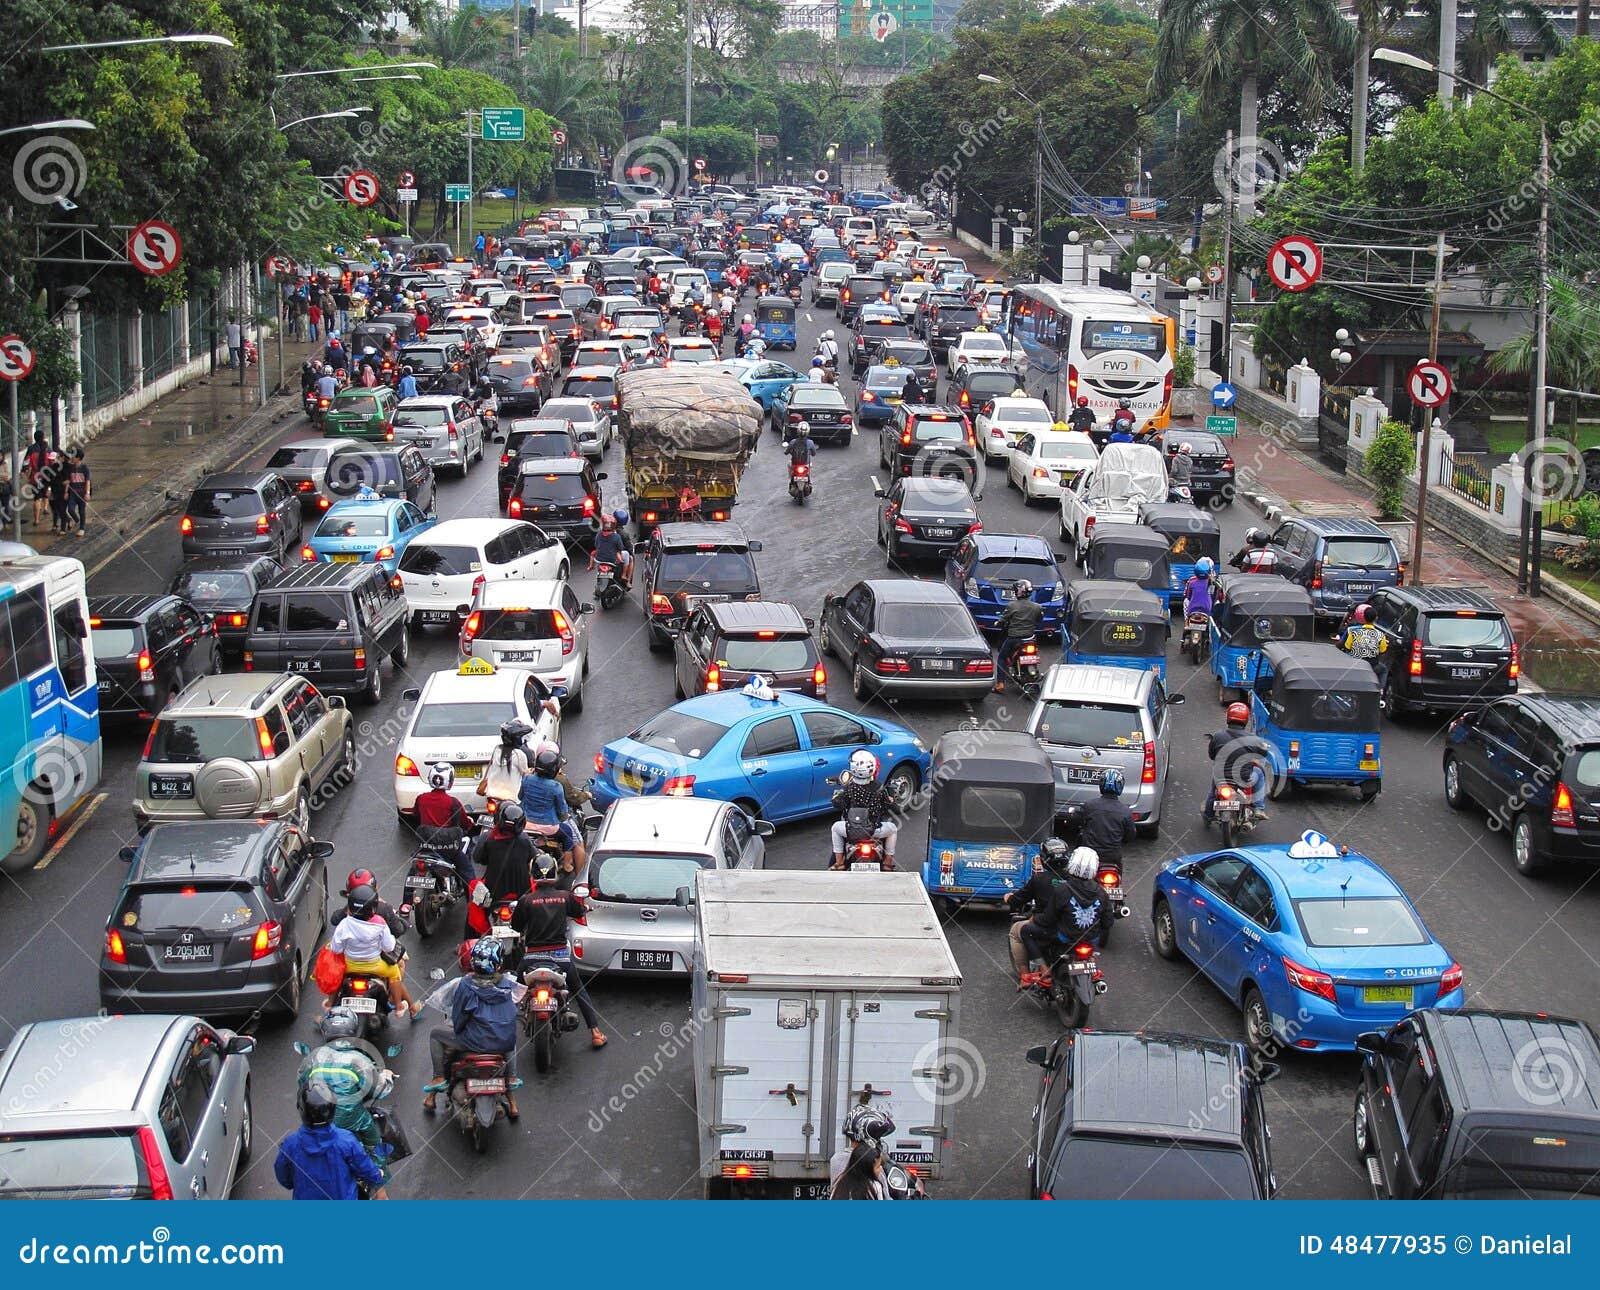 jakarta indonesia traffic - photo #11